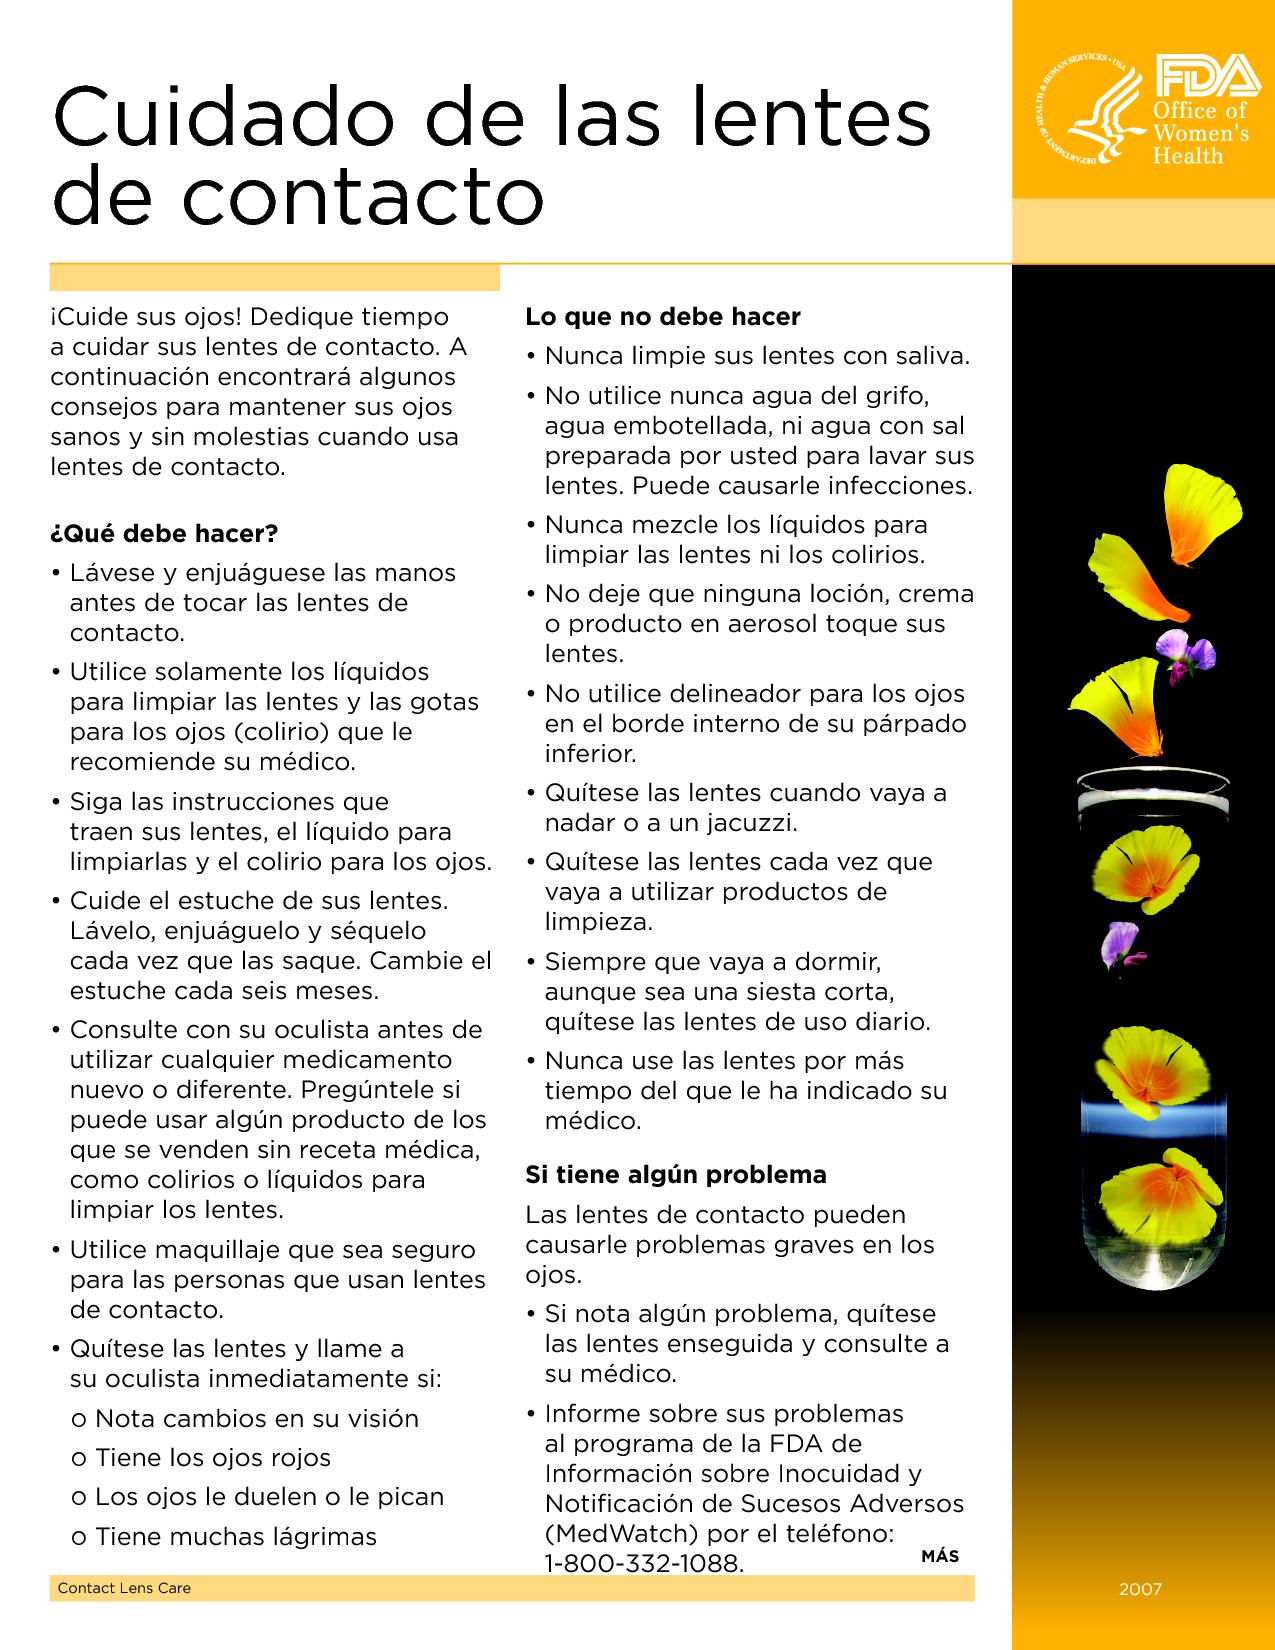 ad1f2f873e Riesgos al usar lentes de contacto | Zona Selecta | Pinterest ...